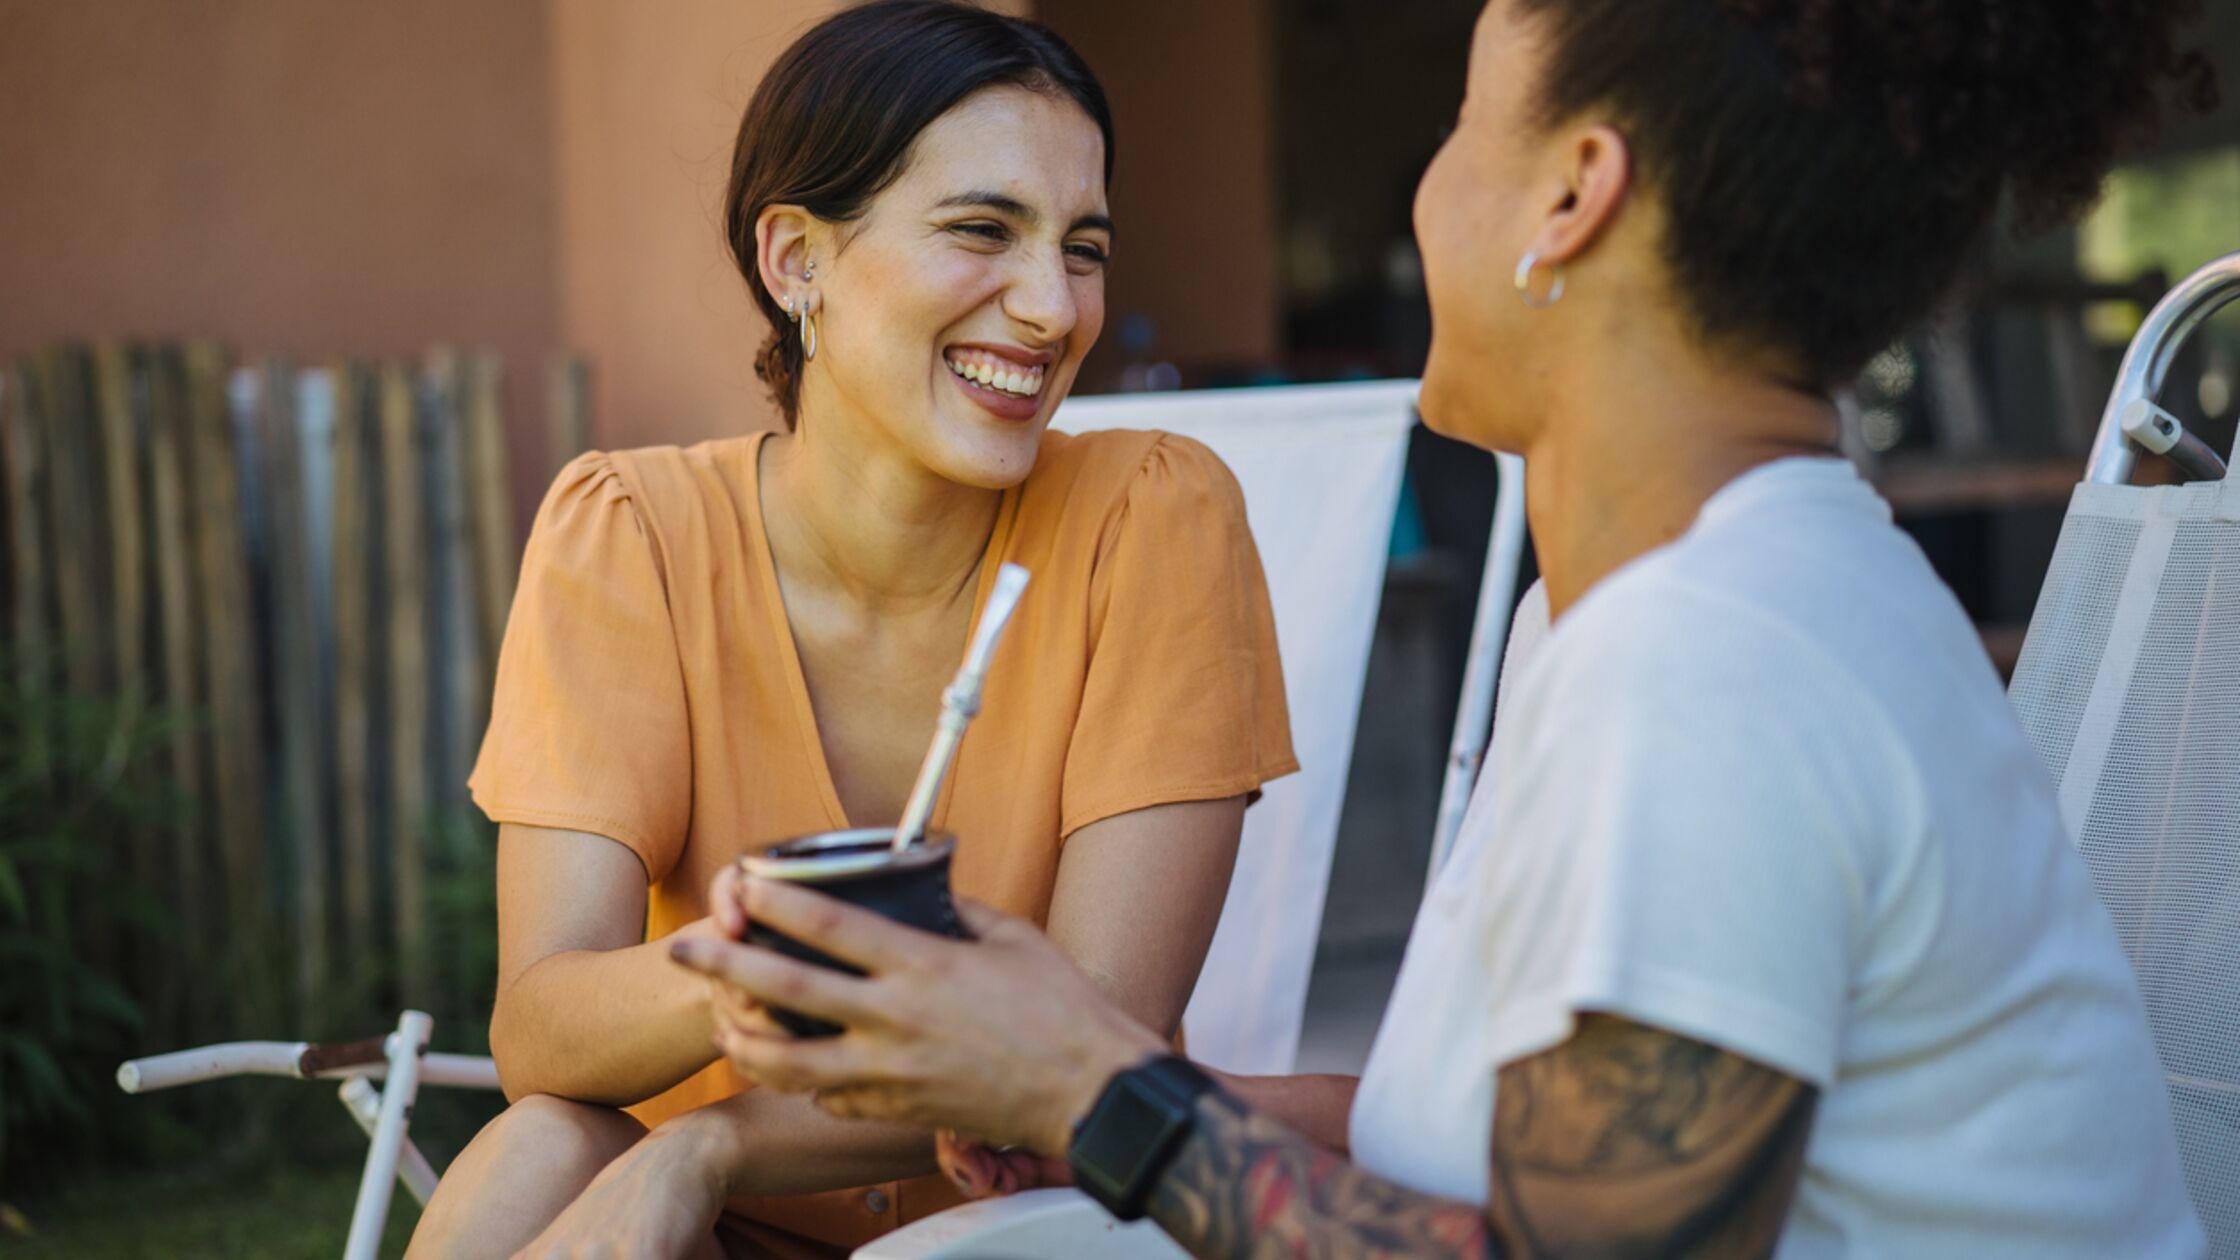 Frauen teilen sich Mate